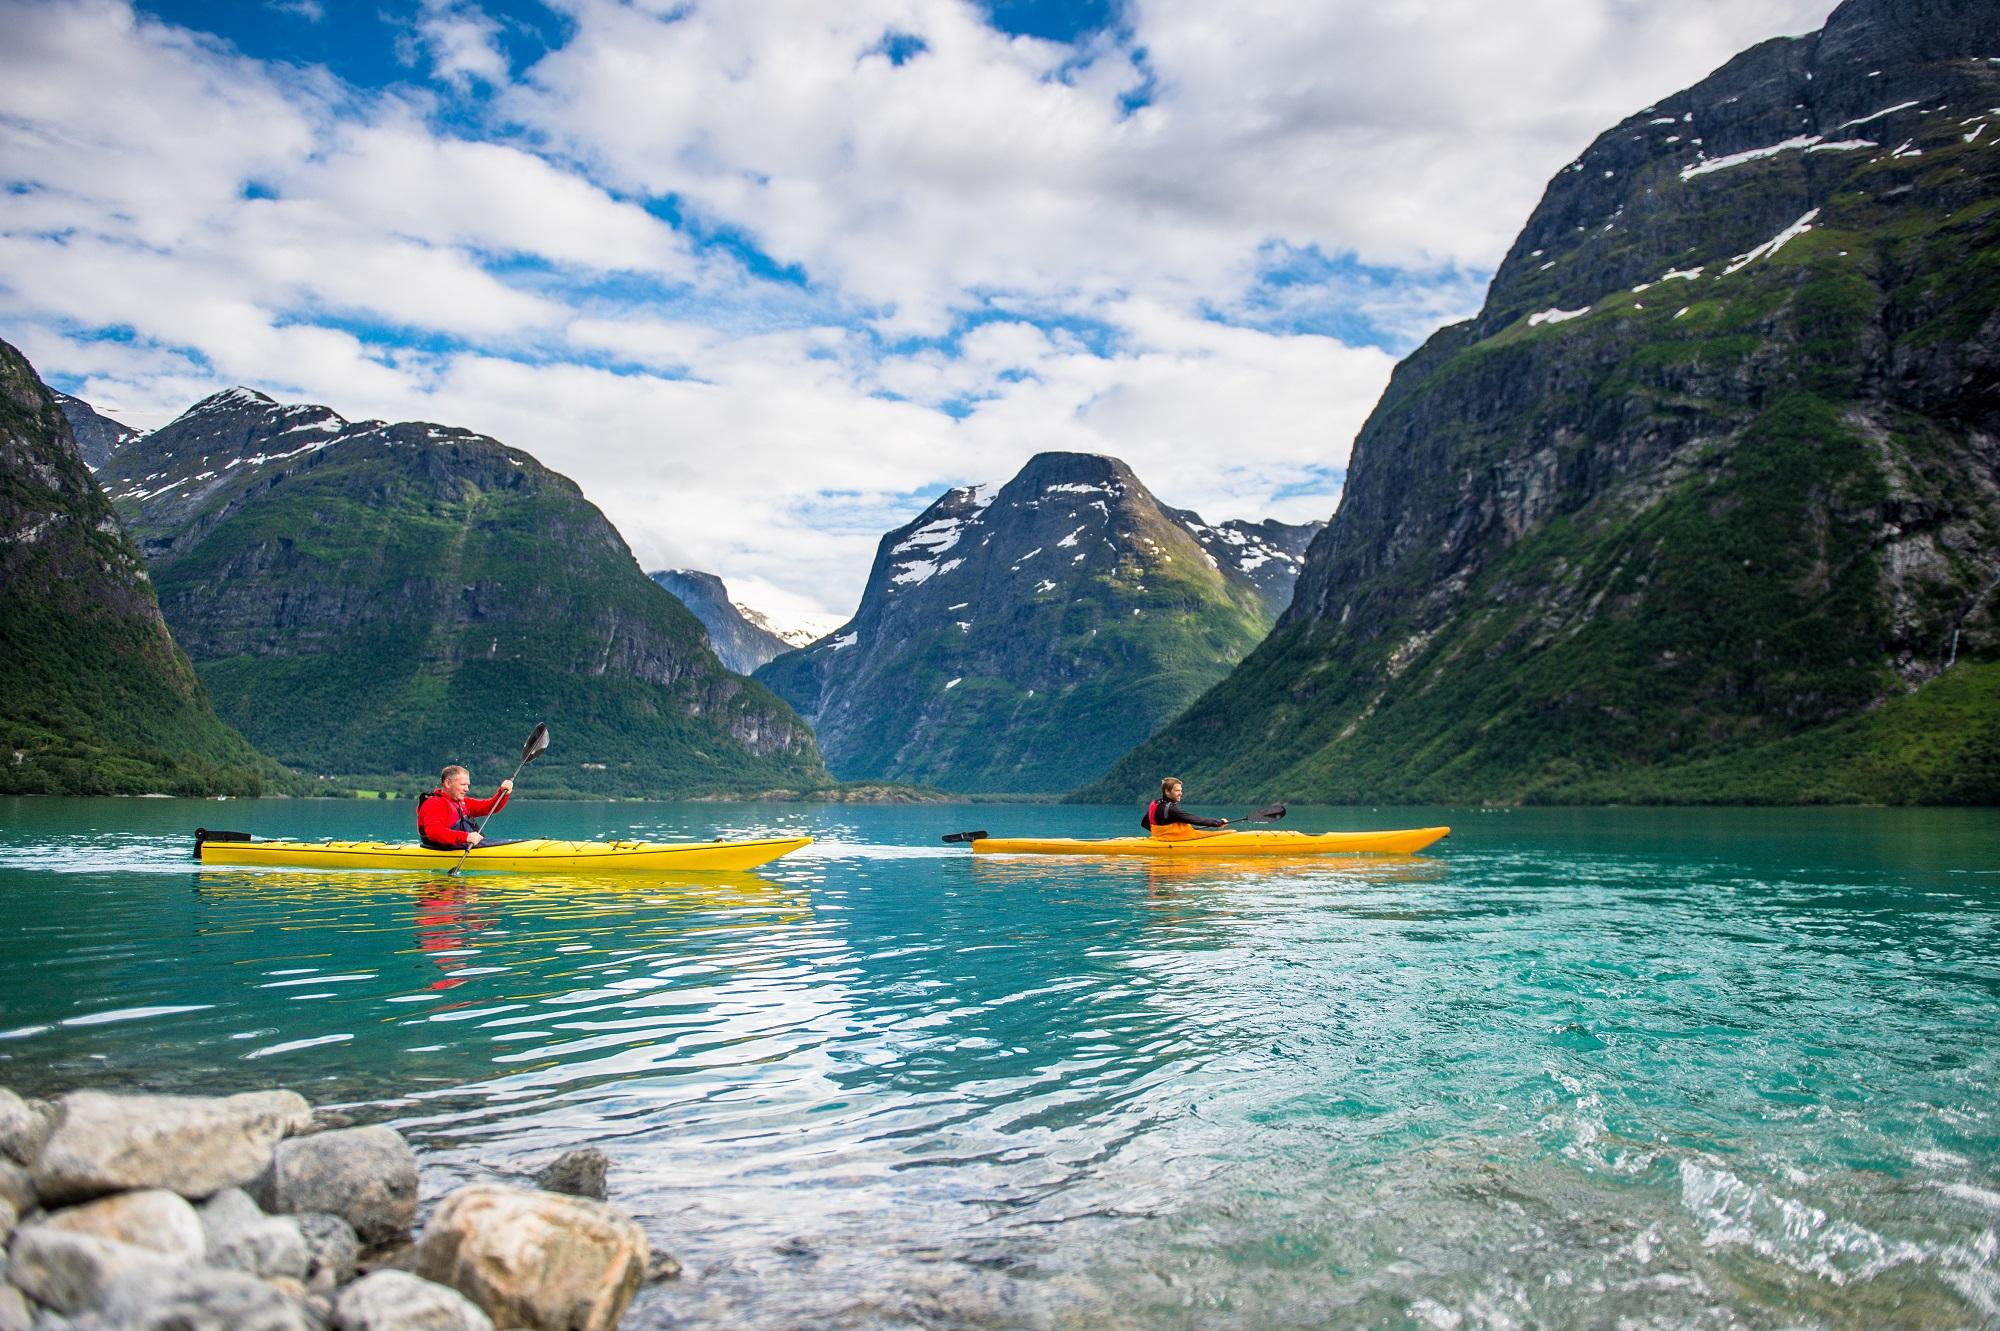 Kayaking in Lodalen